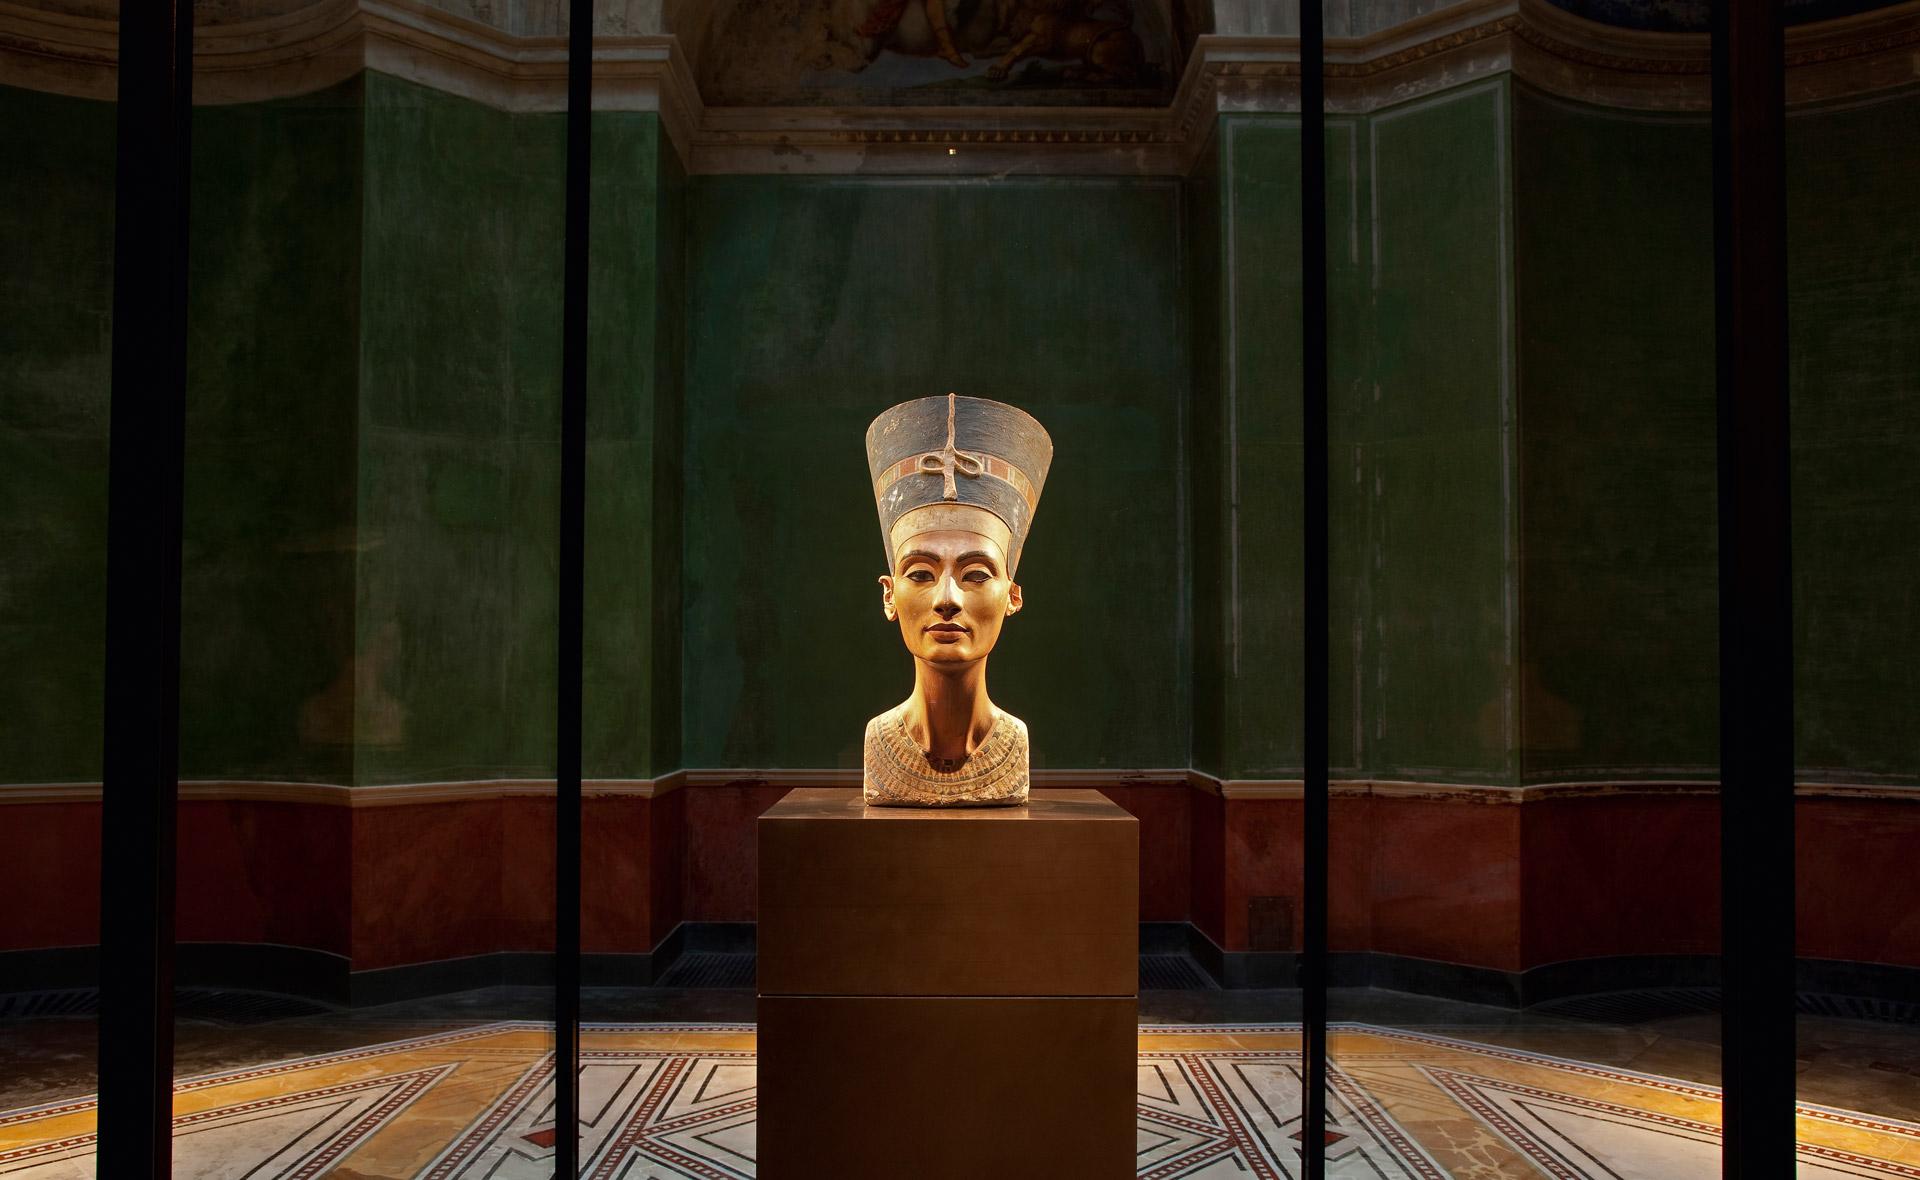 berlino il neues museum a berlino